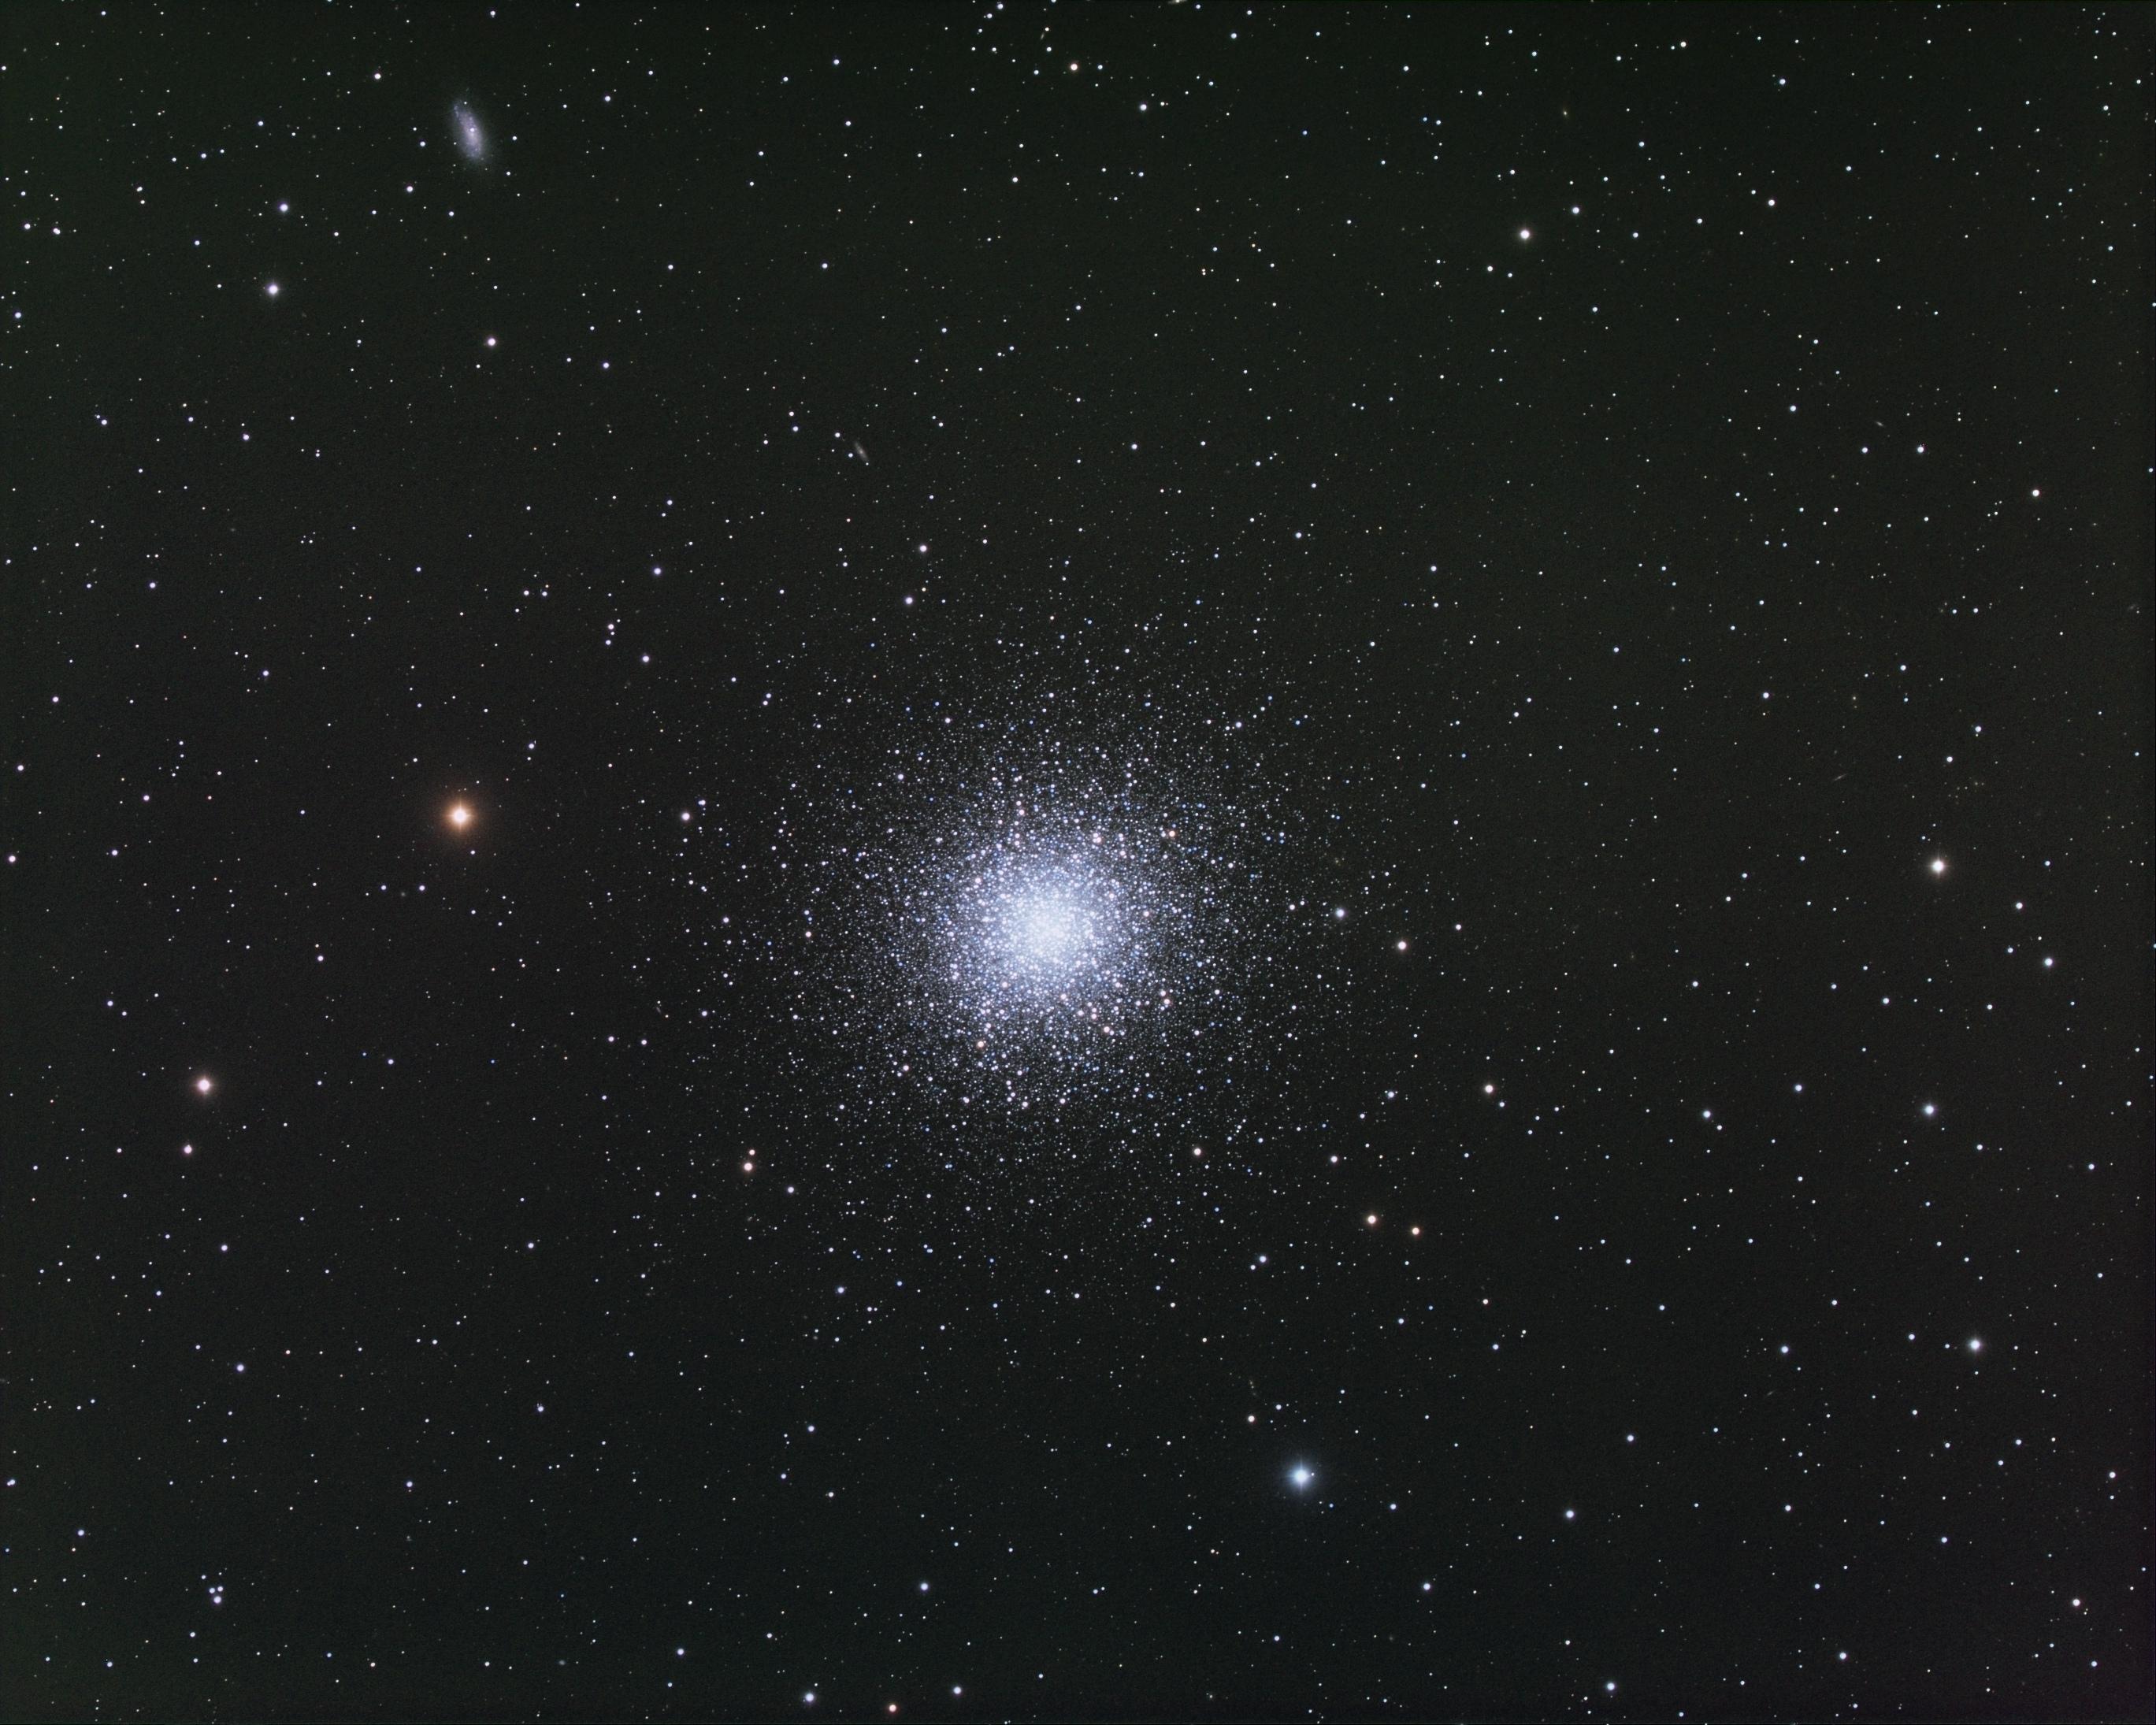 large_M13.jpg.0d5a69da52adf4c4c23c8f9b71f25e82.jpg